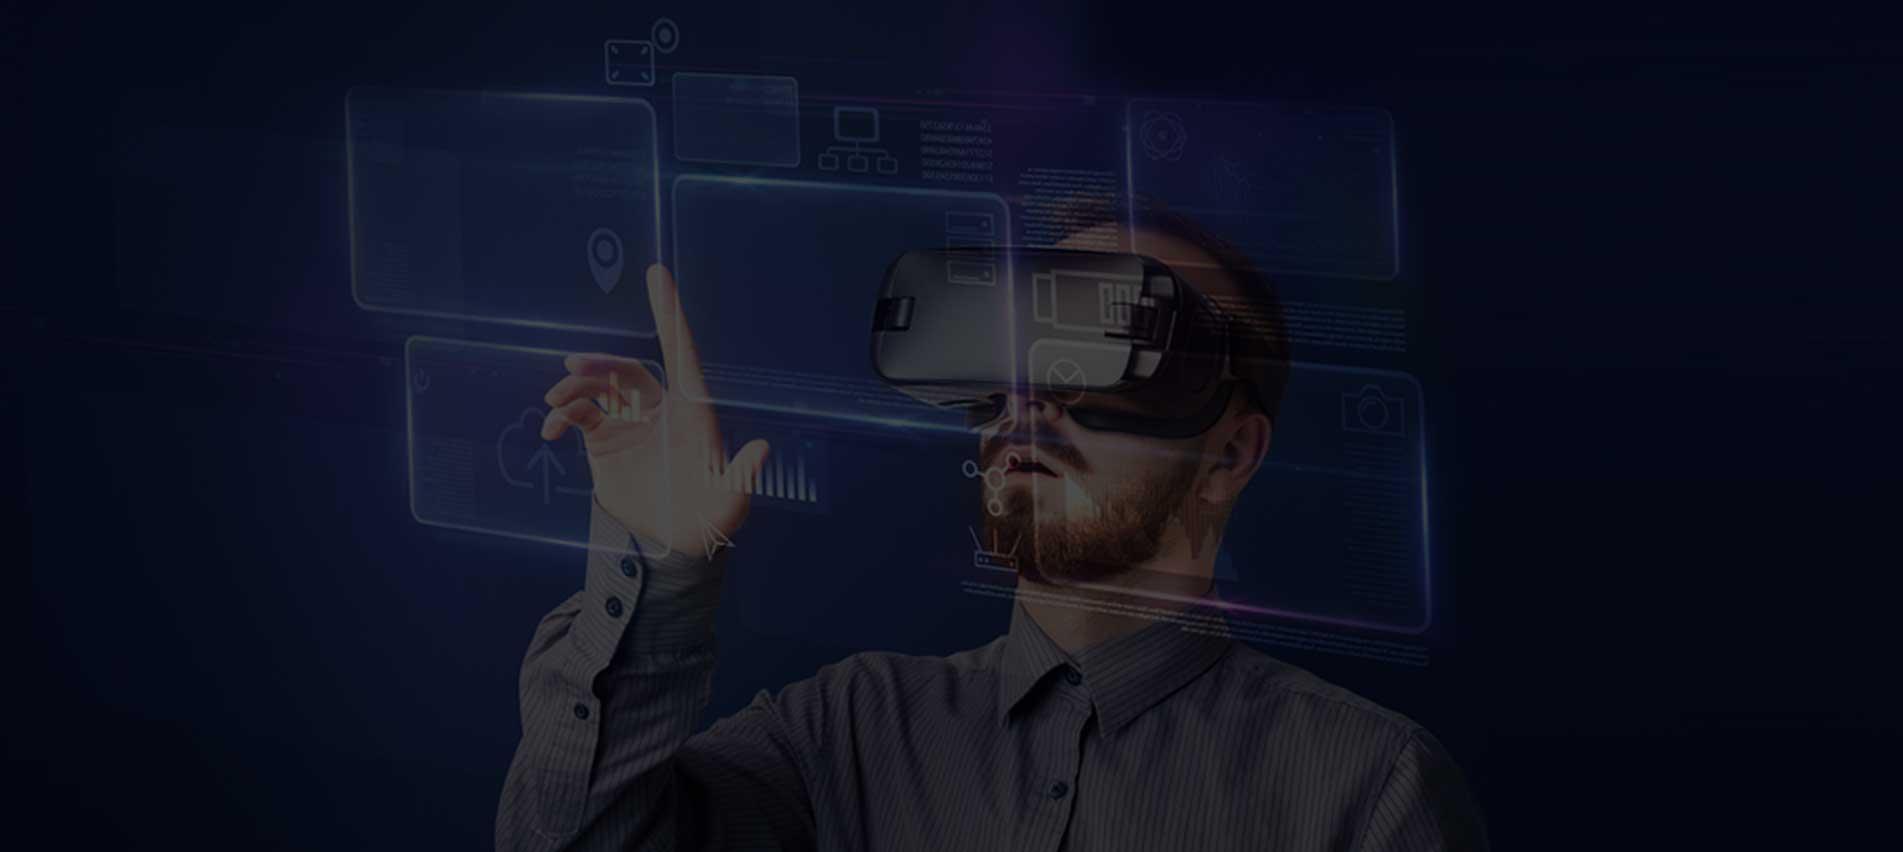 Mixed Reality Development   Hololens App Development Company